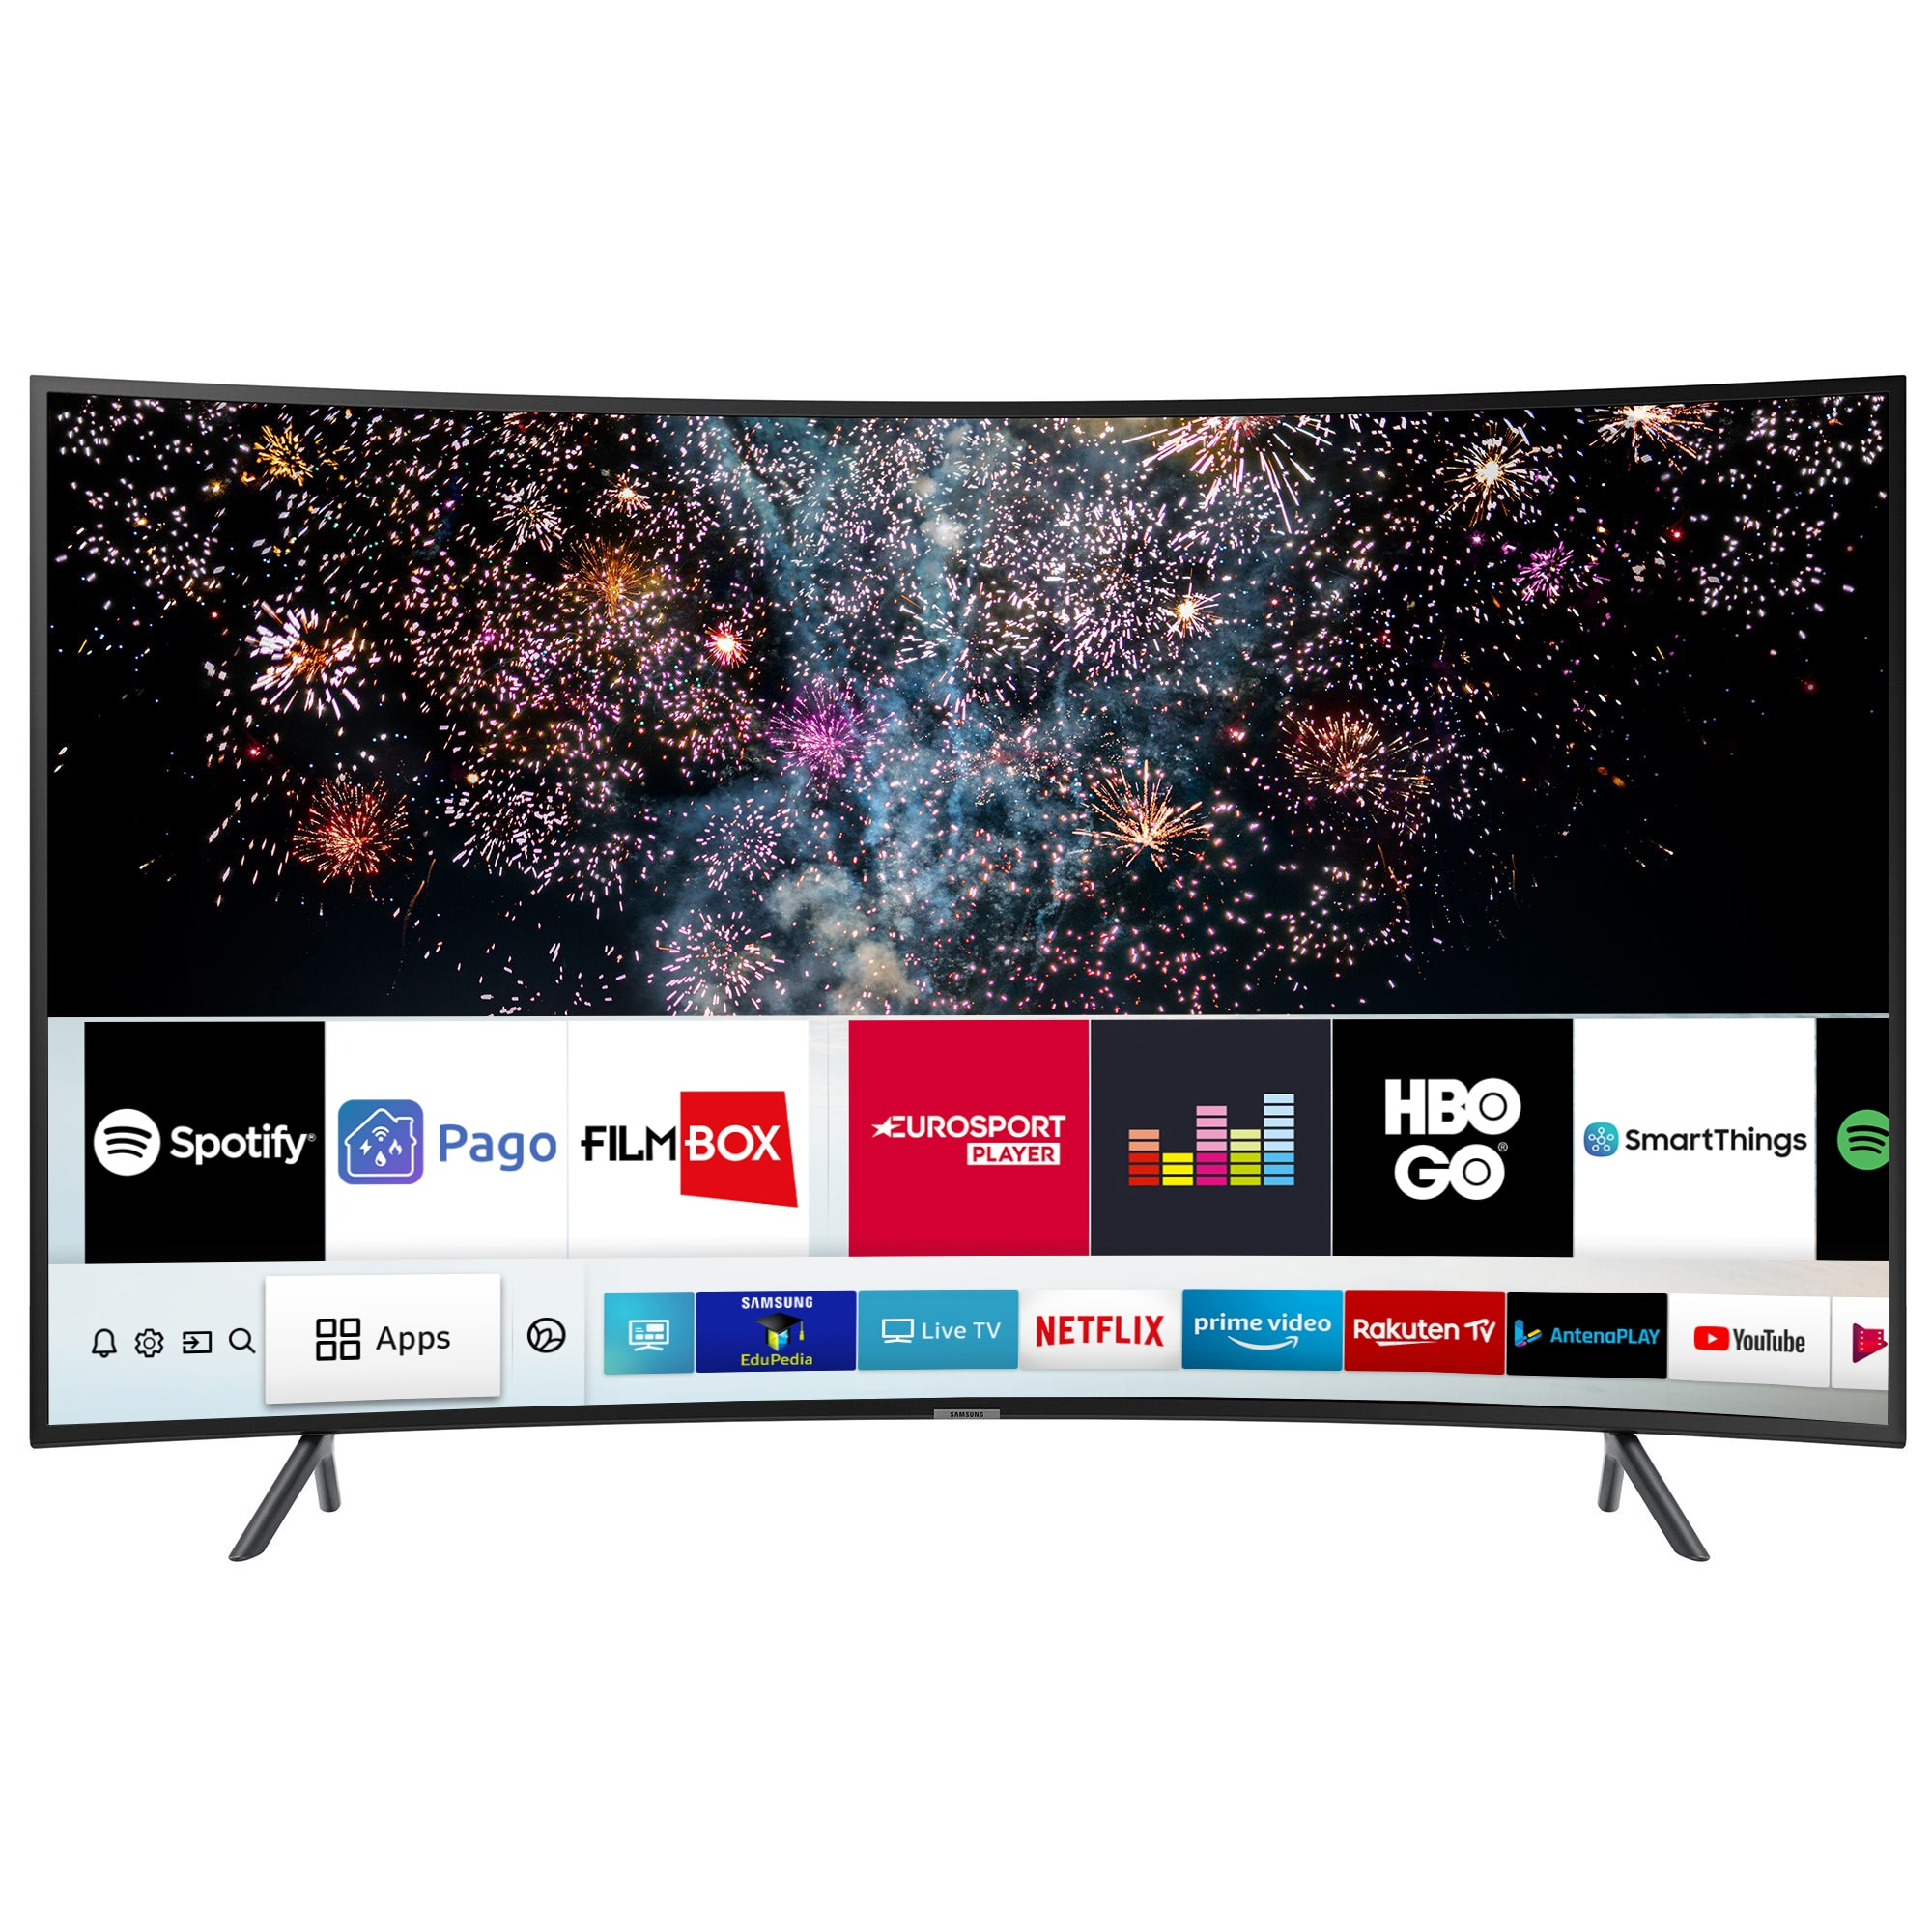 Fotografie Televizor LED curbat Smart Samsung, 123 cm, 49RU7302, 4K Ultra HD, Clasa A